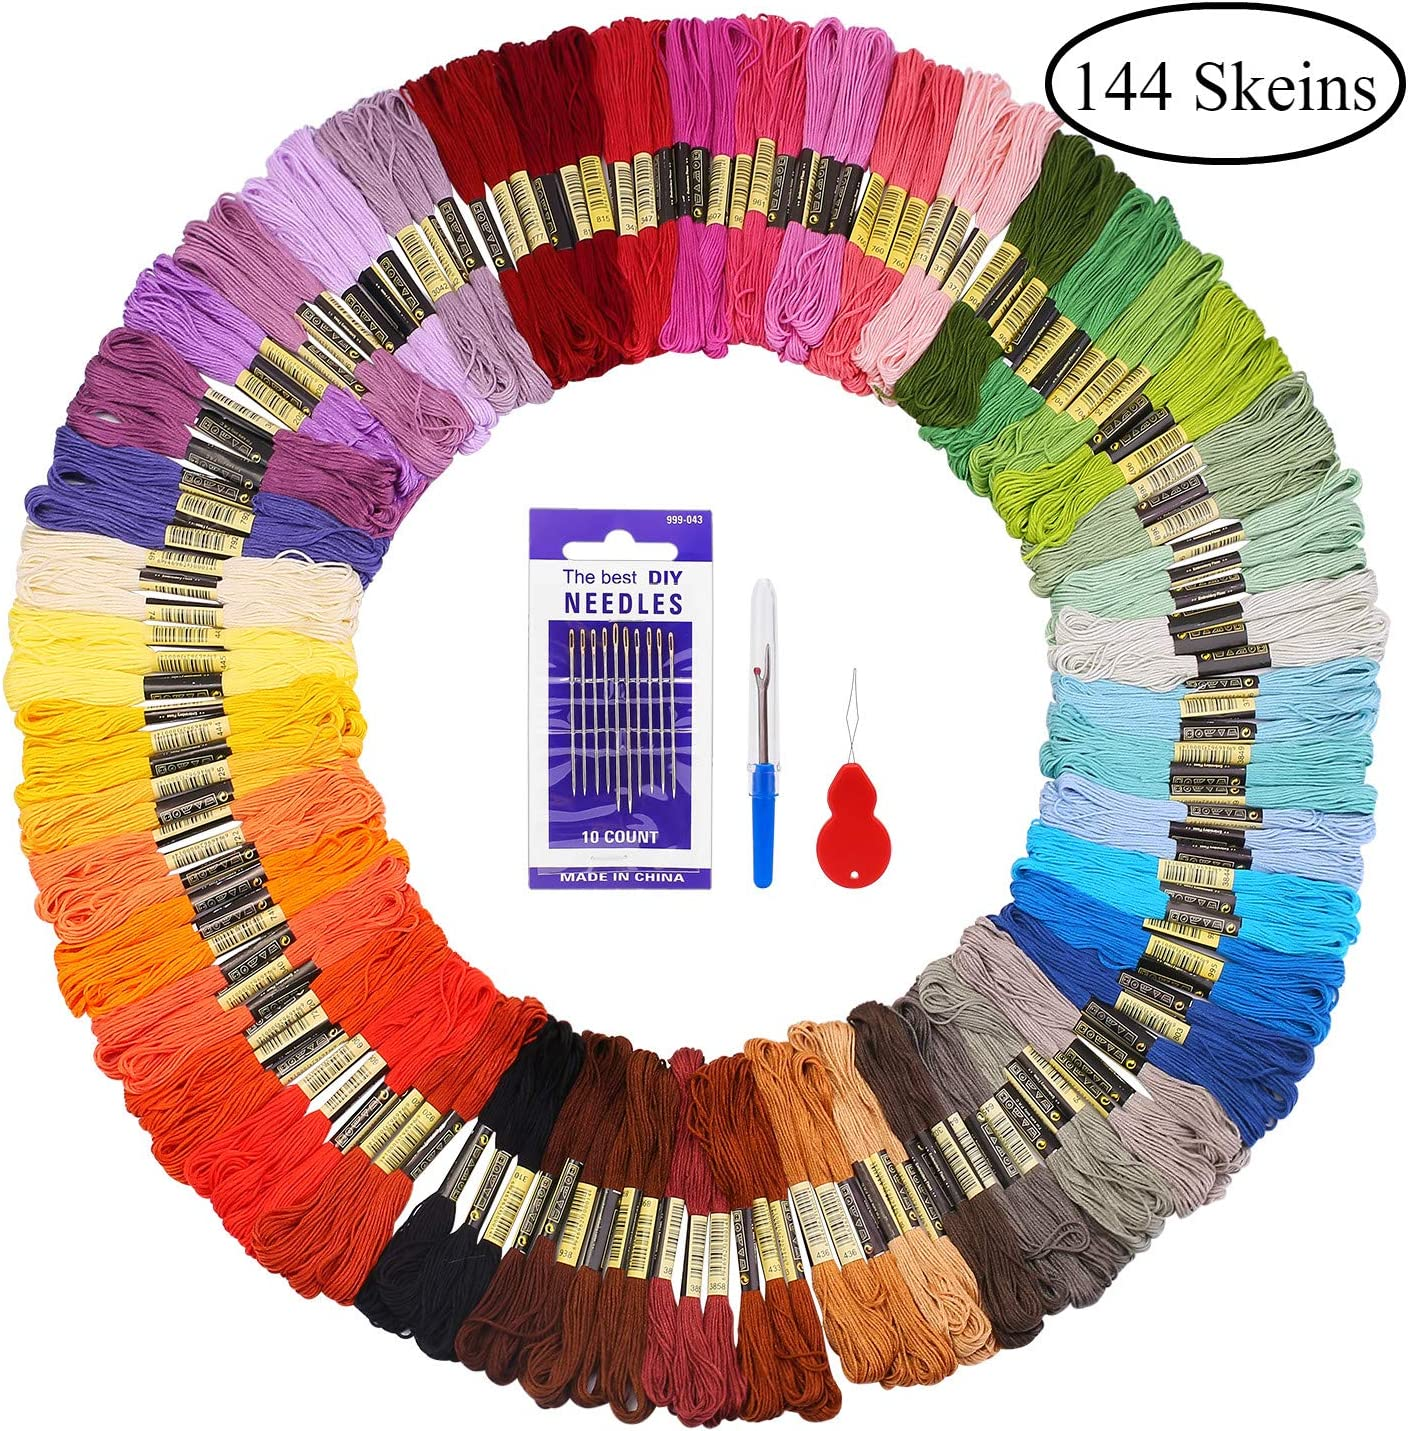 Madejas de Hilos 144 Madejas 48 Colores Fuyit Hilos de Bordar de Algodón Bordado Kit de Hilos Cross Stitch Bordado Hilos